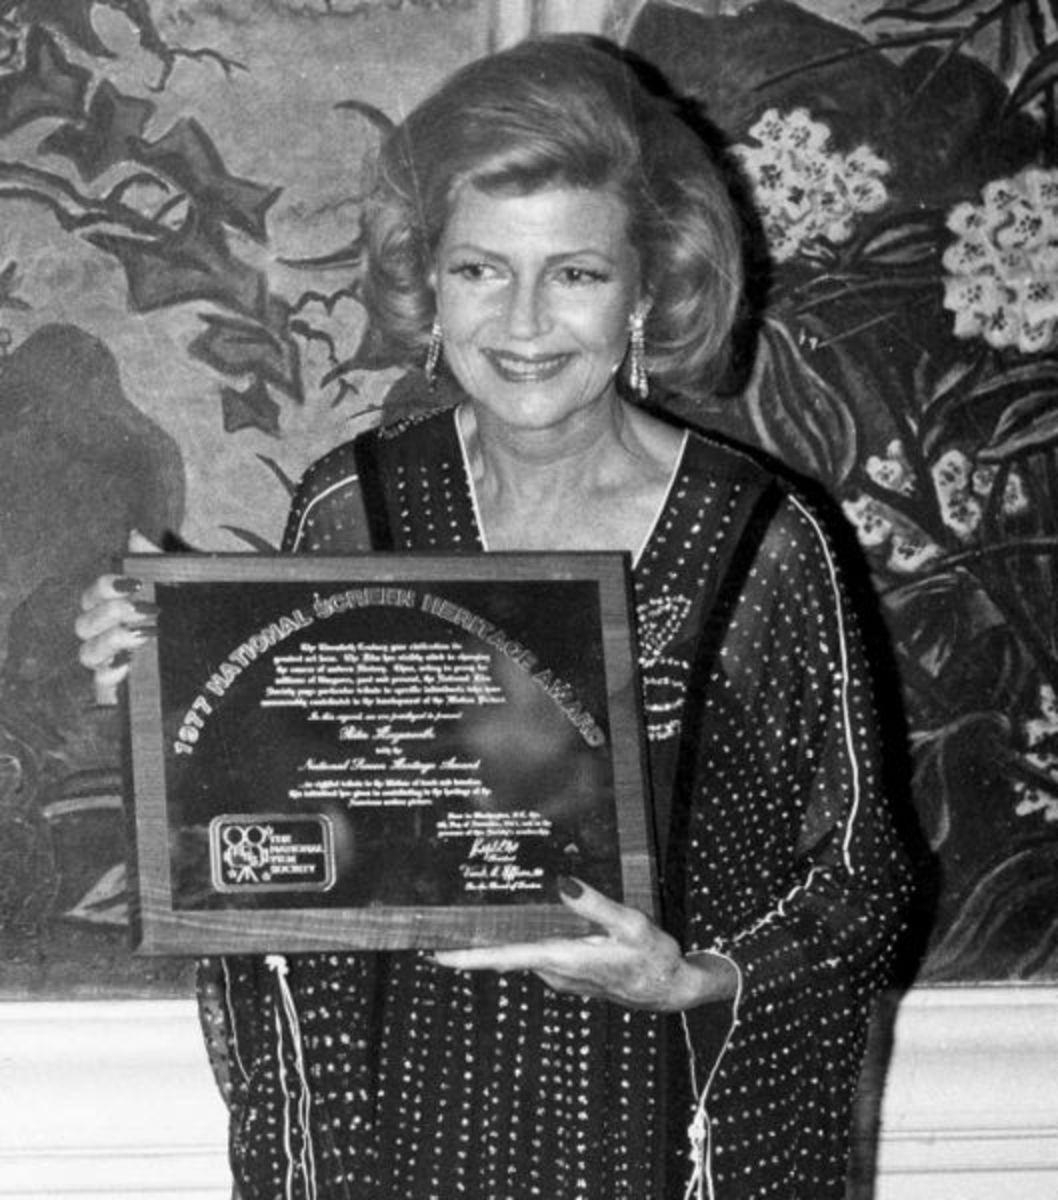 Rita in 1977 receiving the National Film Heritage Award